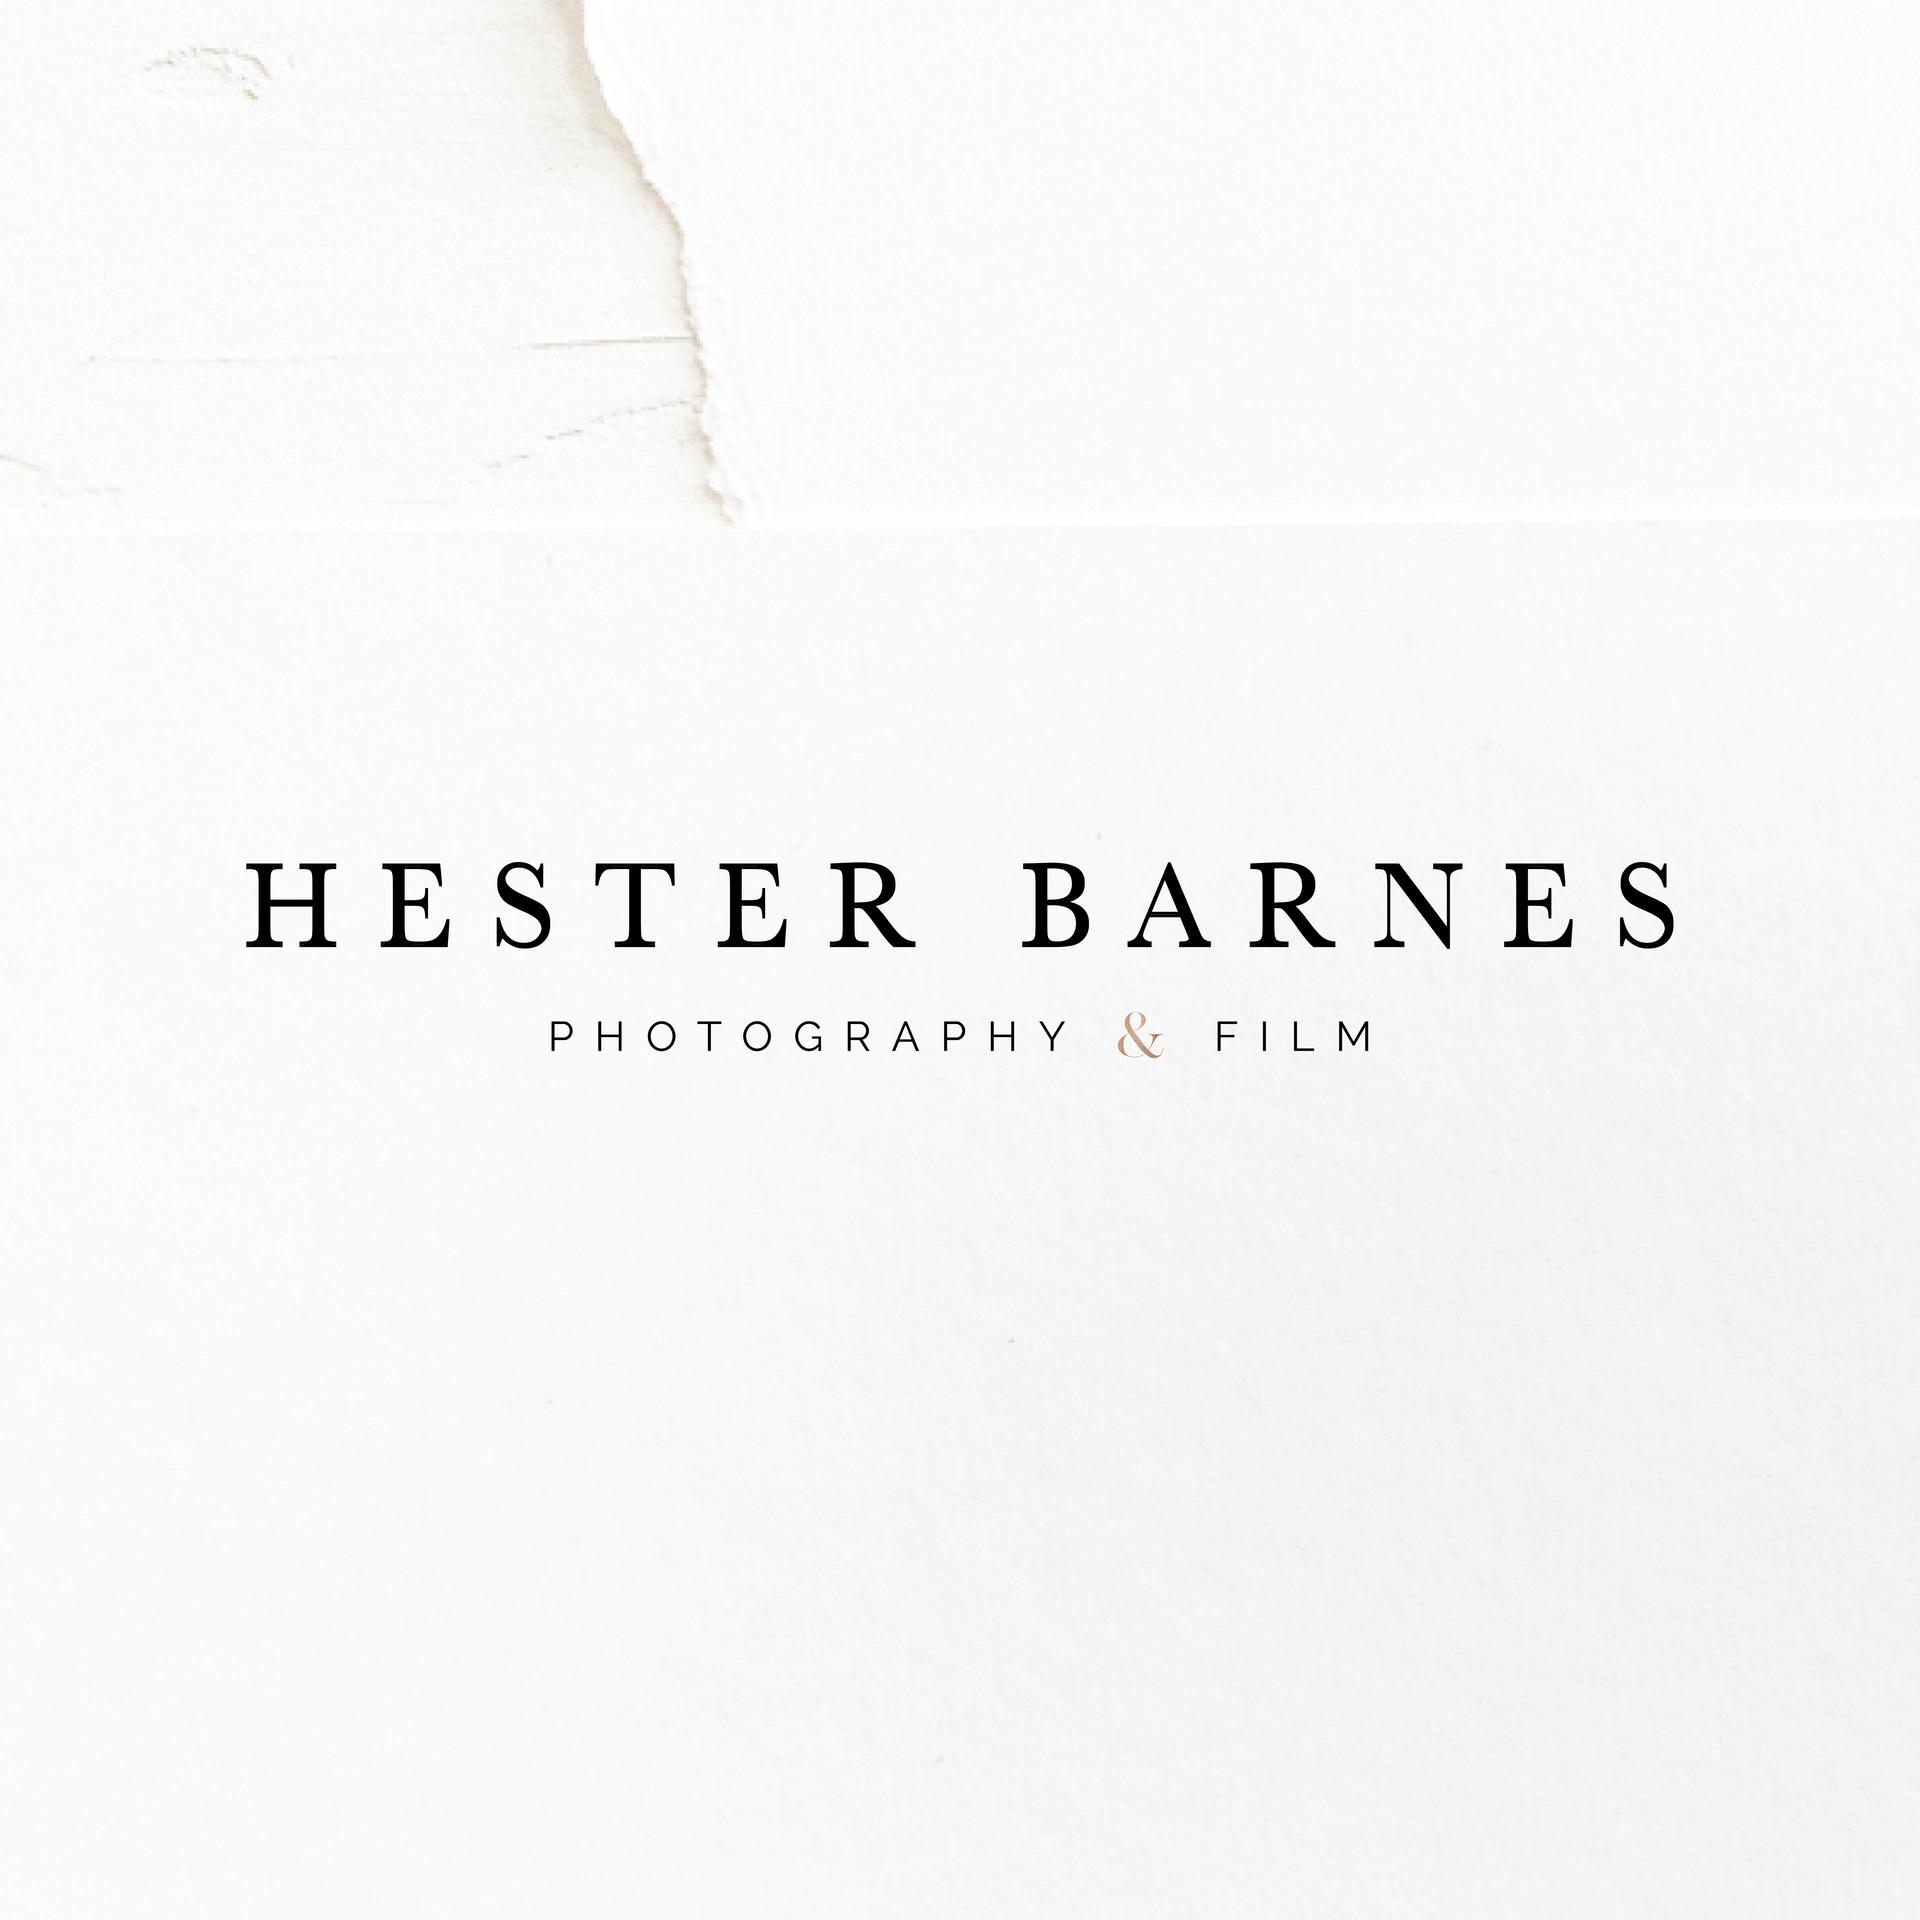 Hester Photographer Branding | Brand Identity Design by Fresh Leaf Creative